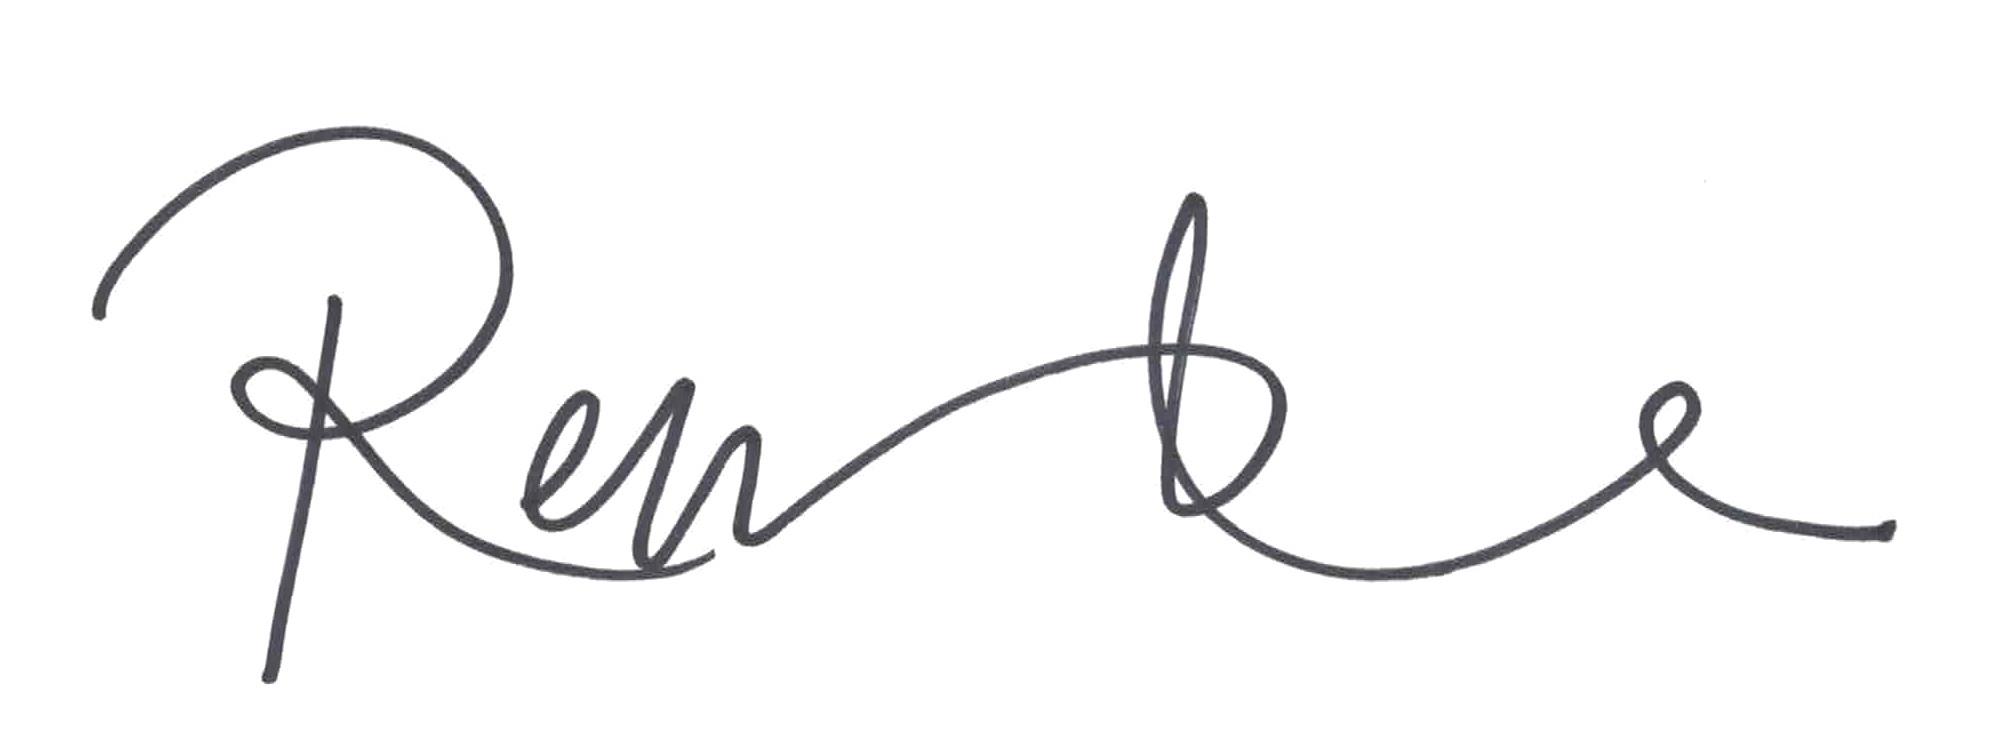 Rebekah signature no background.png